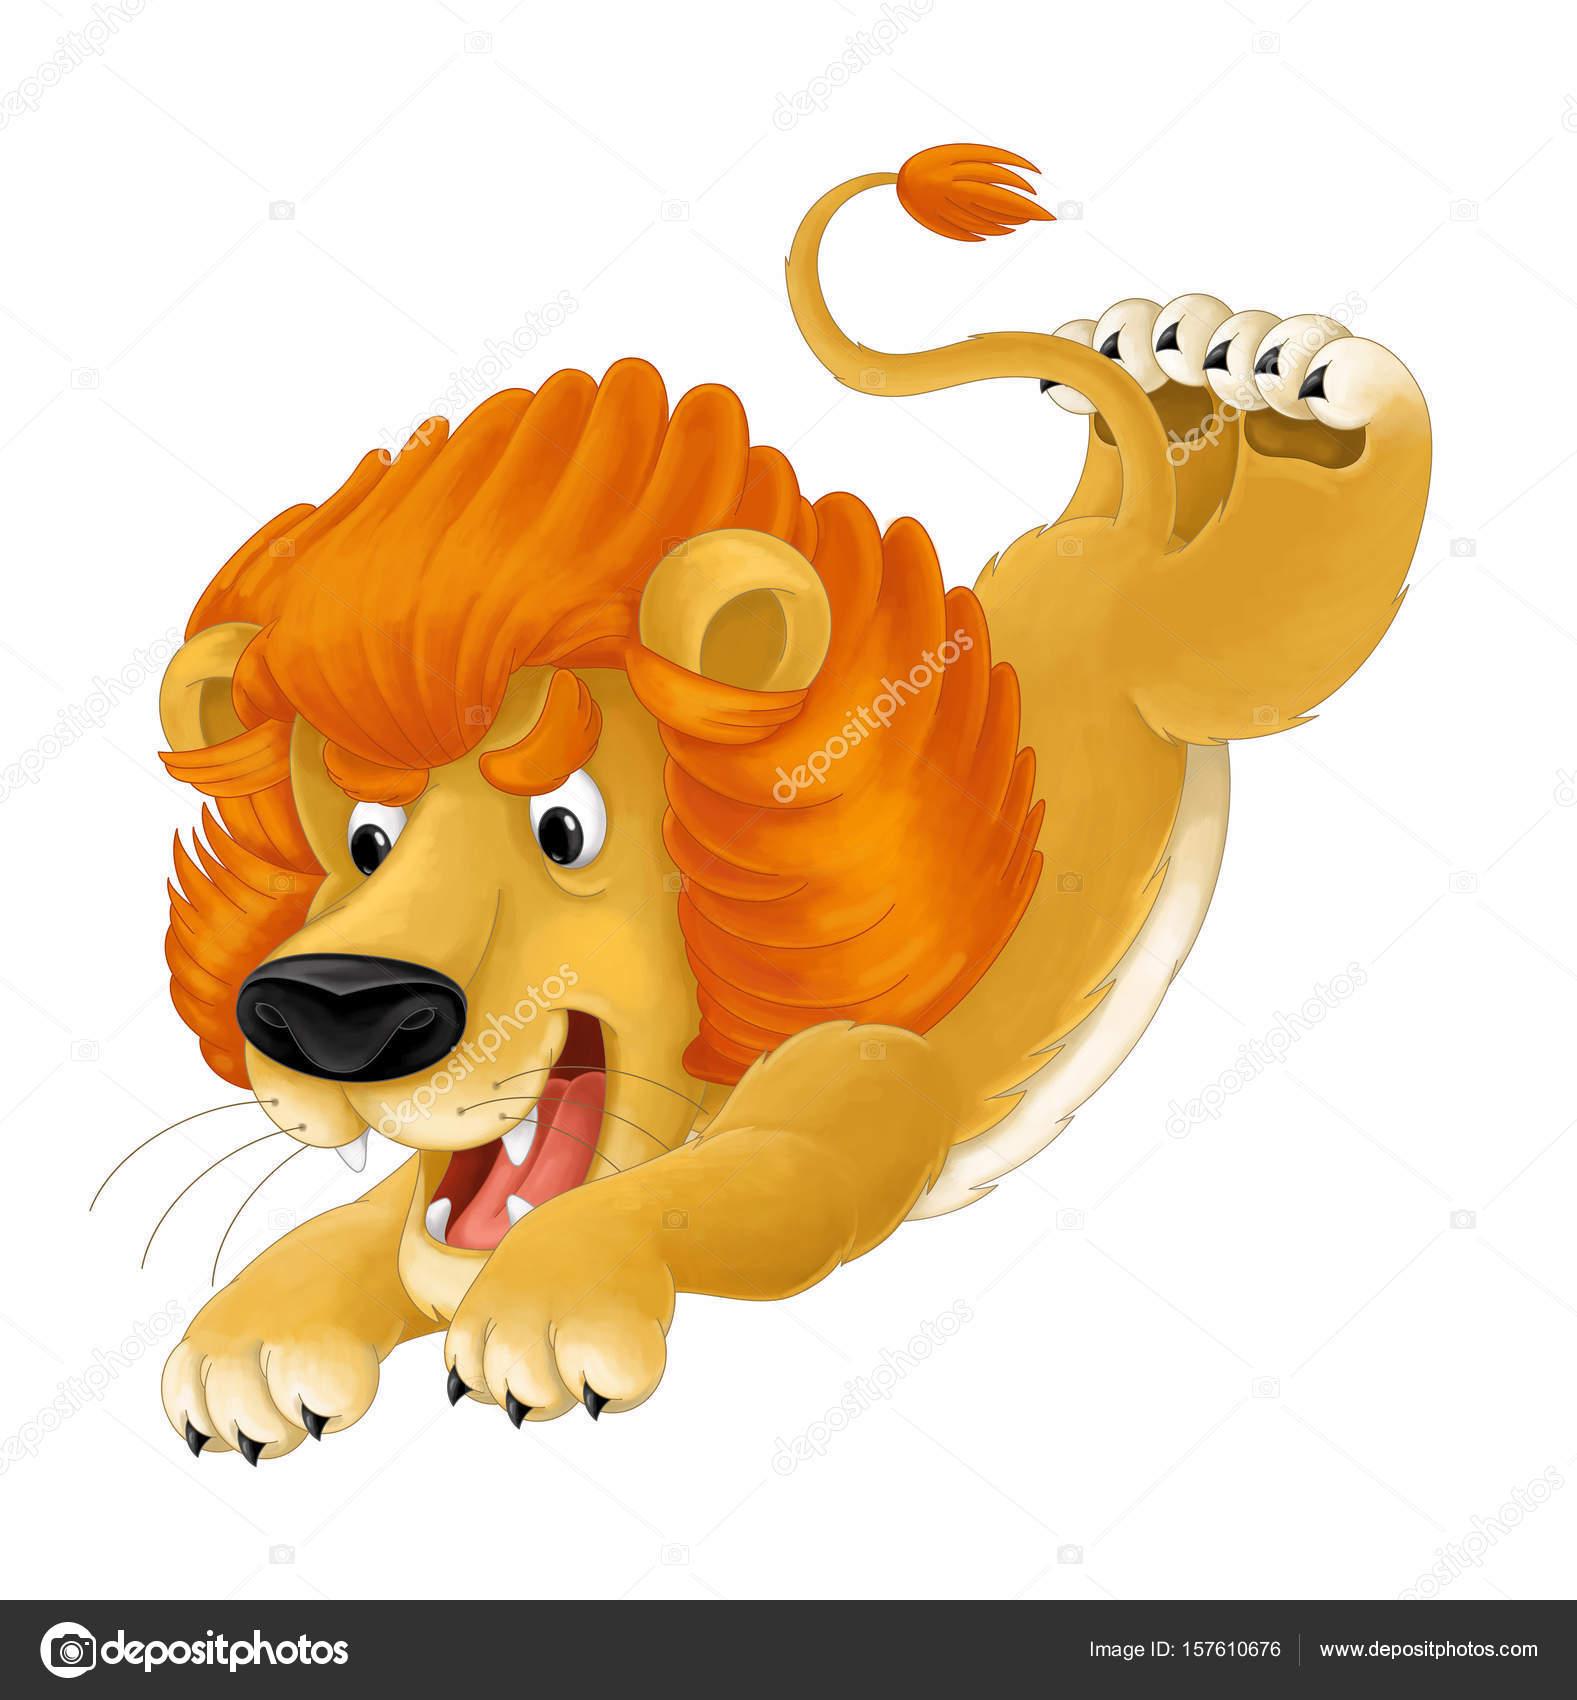 Imagenes Animales Carnivoros Para Ninos Dibujos Animados De